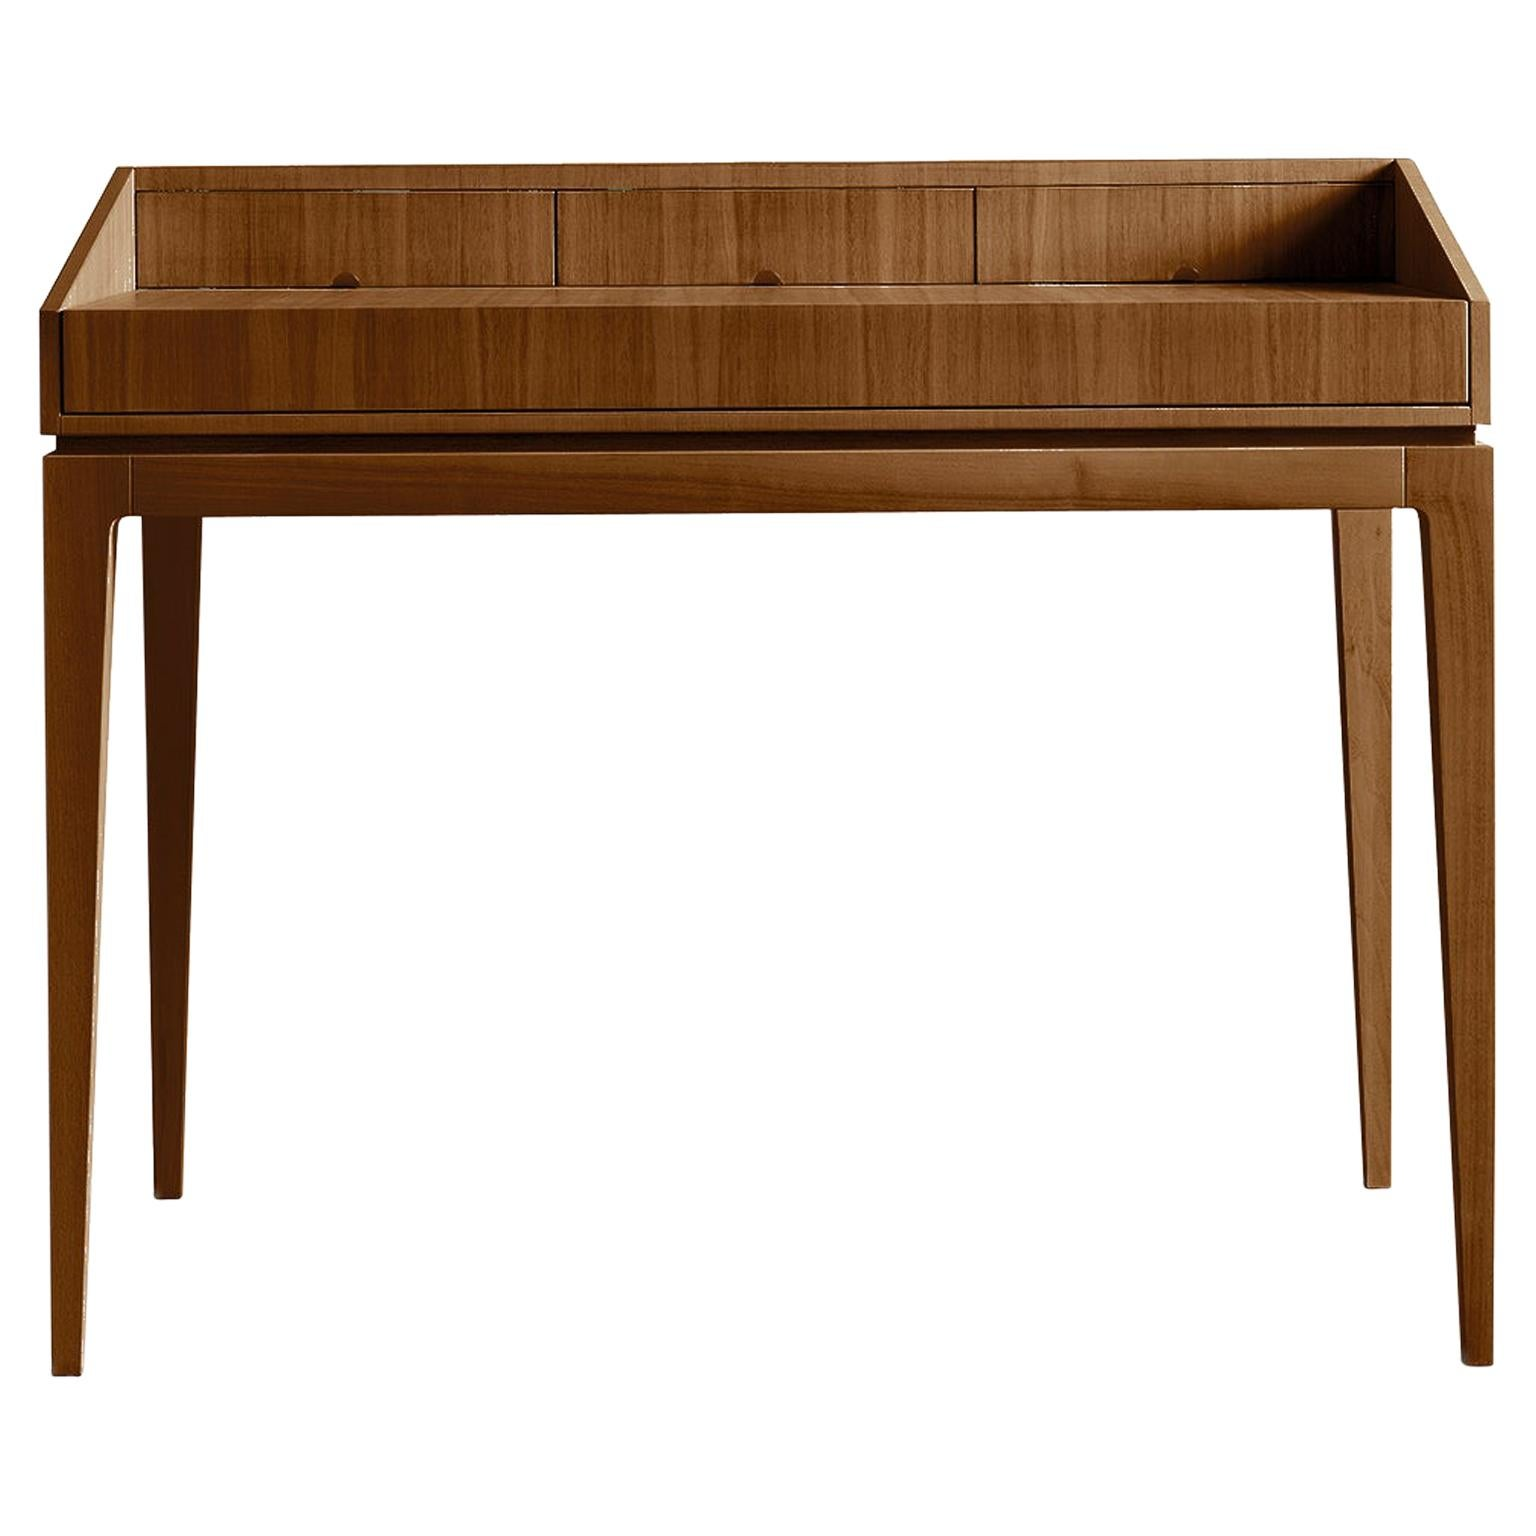 Ideale writing Desk G-151 by Dale Italia